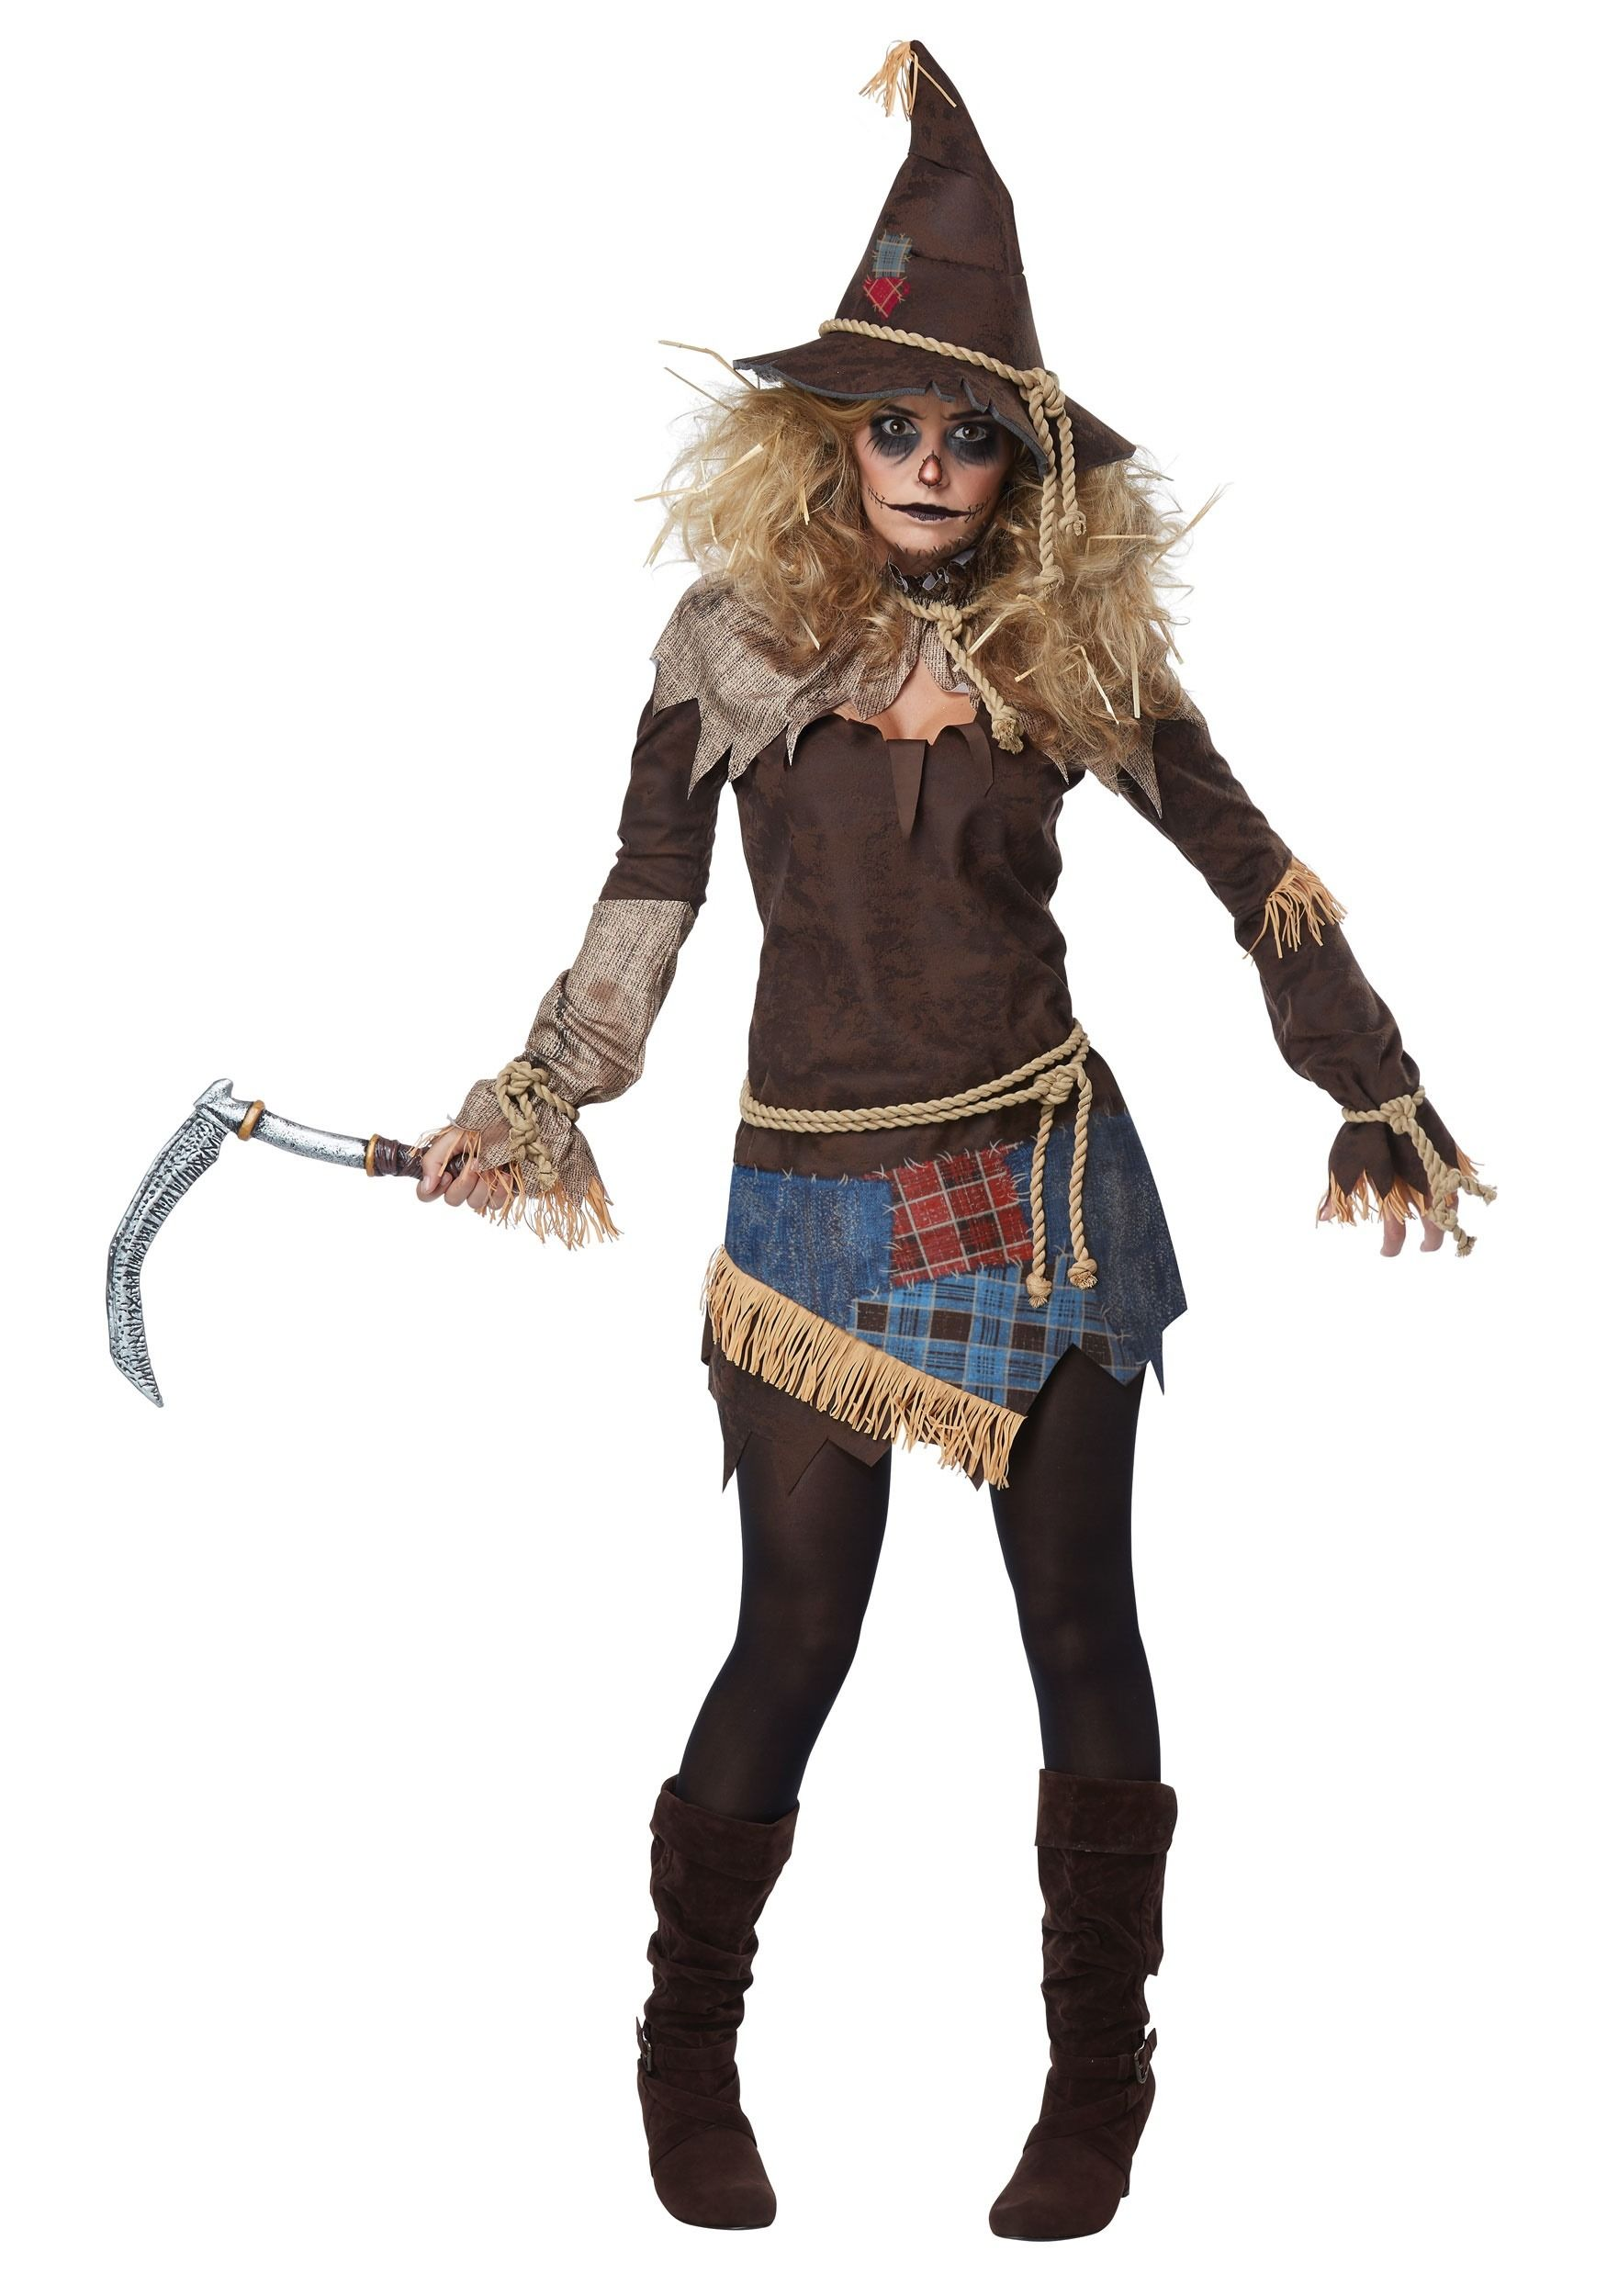 Se encontr en google desde halloweencostumes disfraces se encontr en google desde halloweencostumes solutioingenieria Choice Image